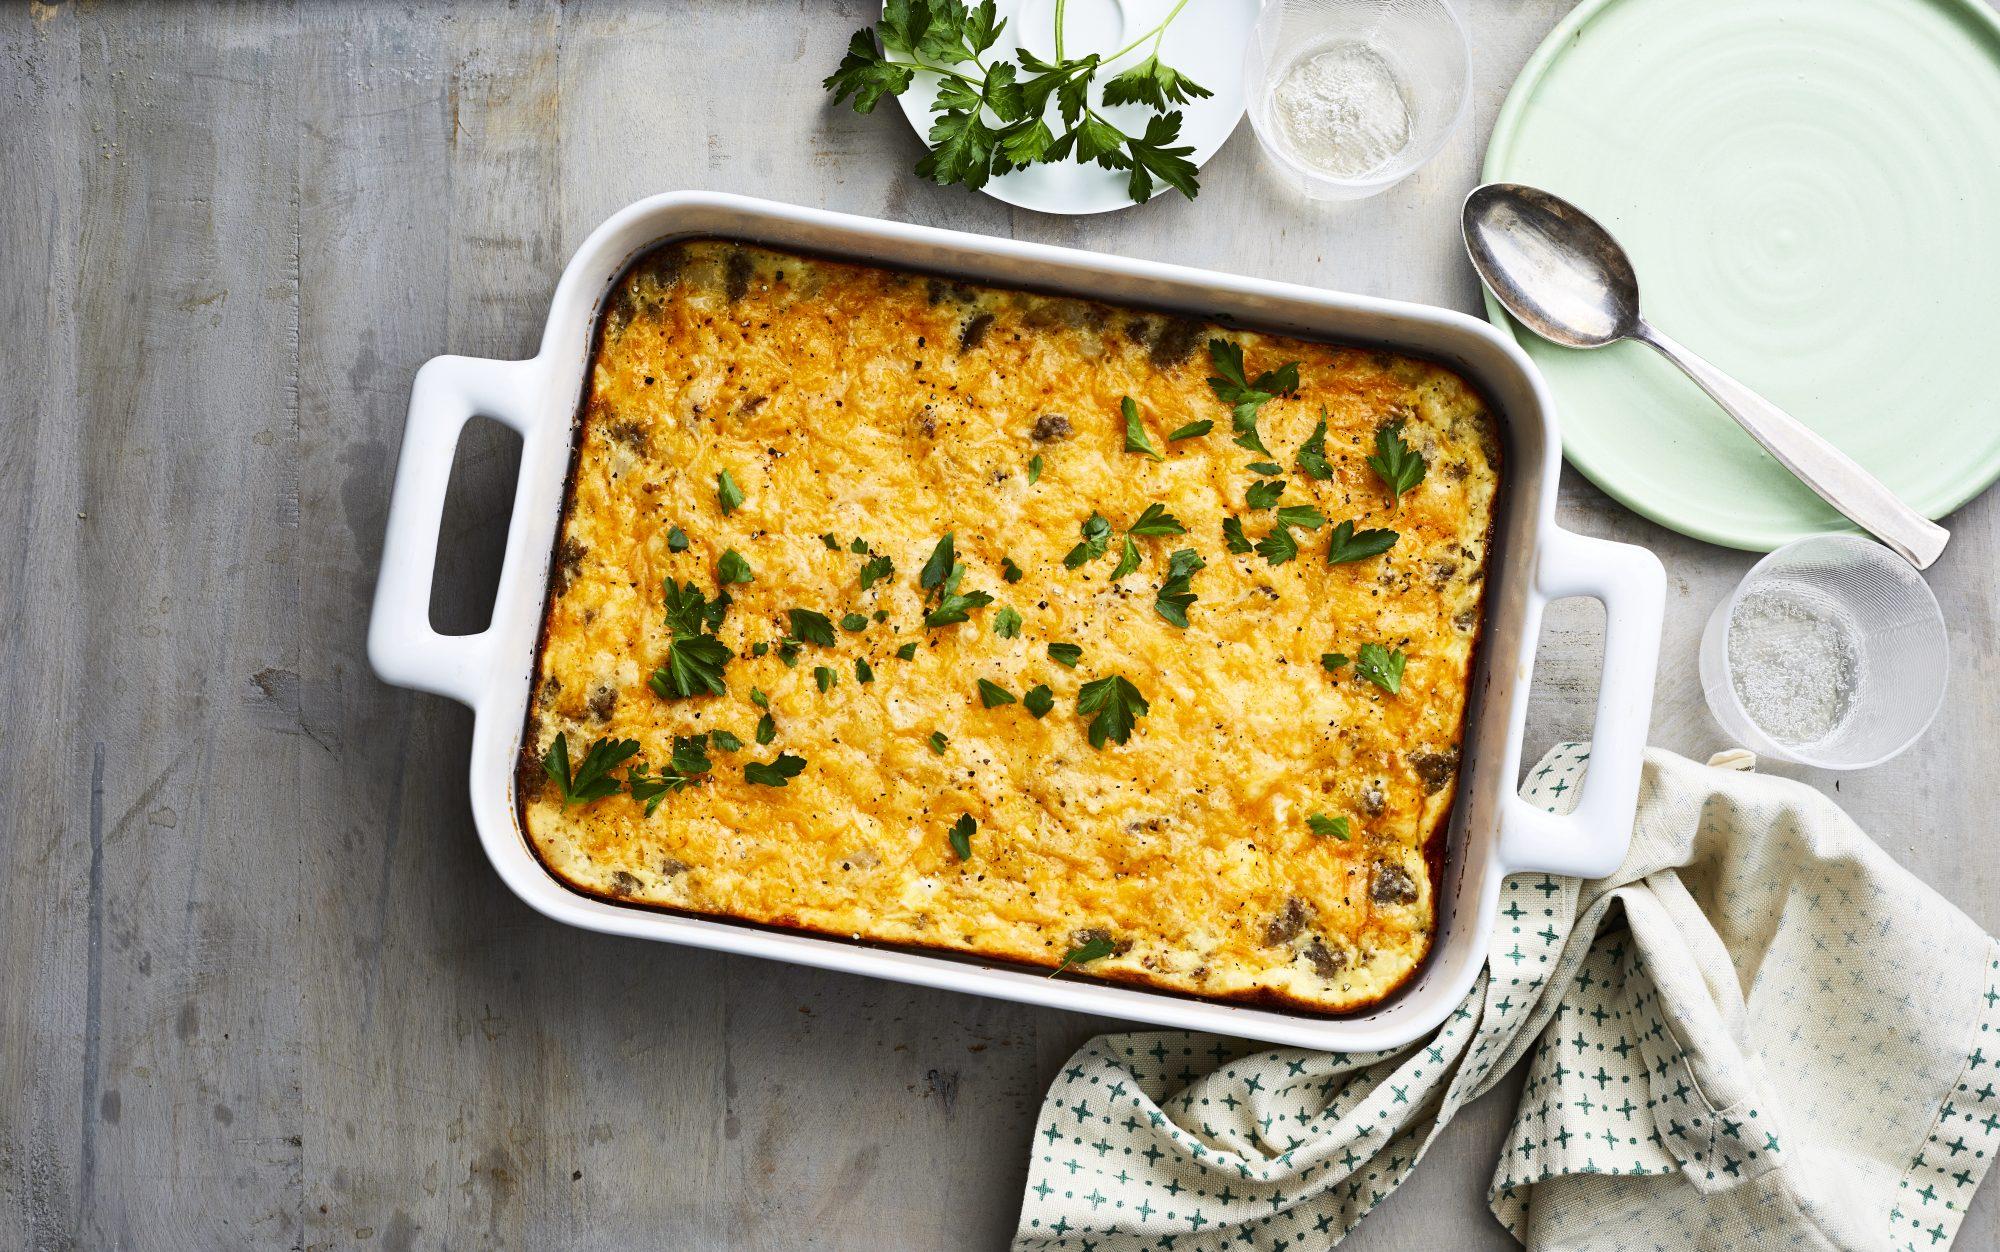 Make ahead vegetarian breakfast casserole with hash browns